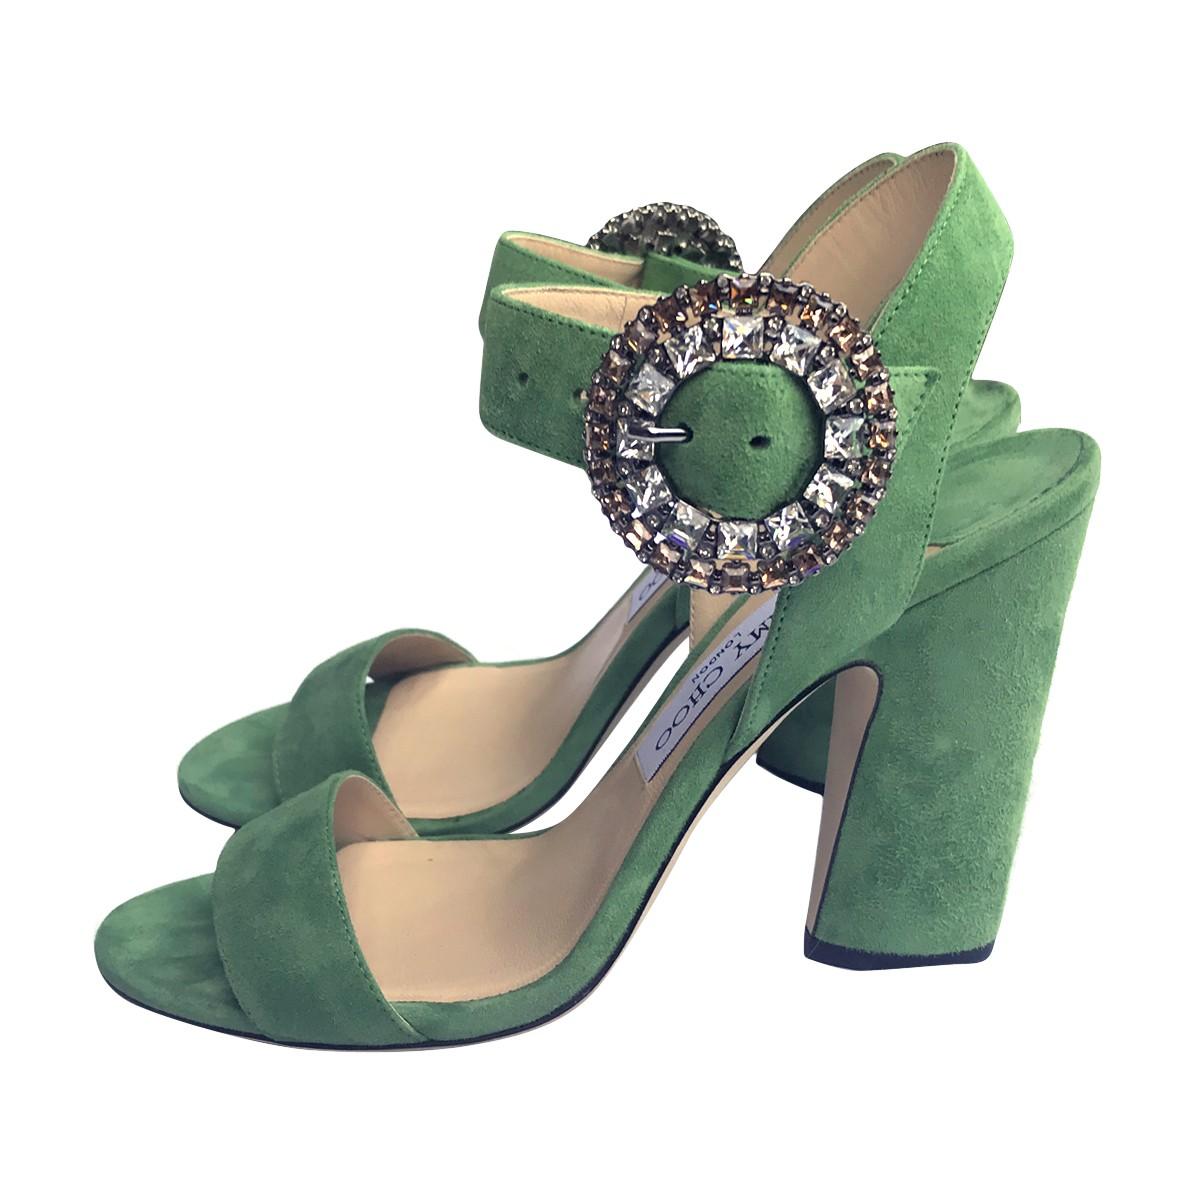 3c80f0647abc14 Jimmy Choo Lime Green Sandals